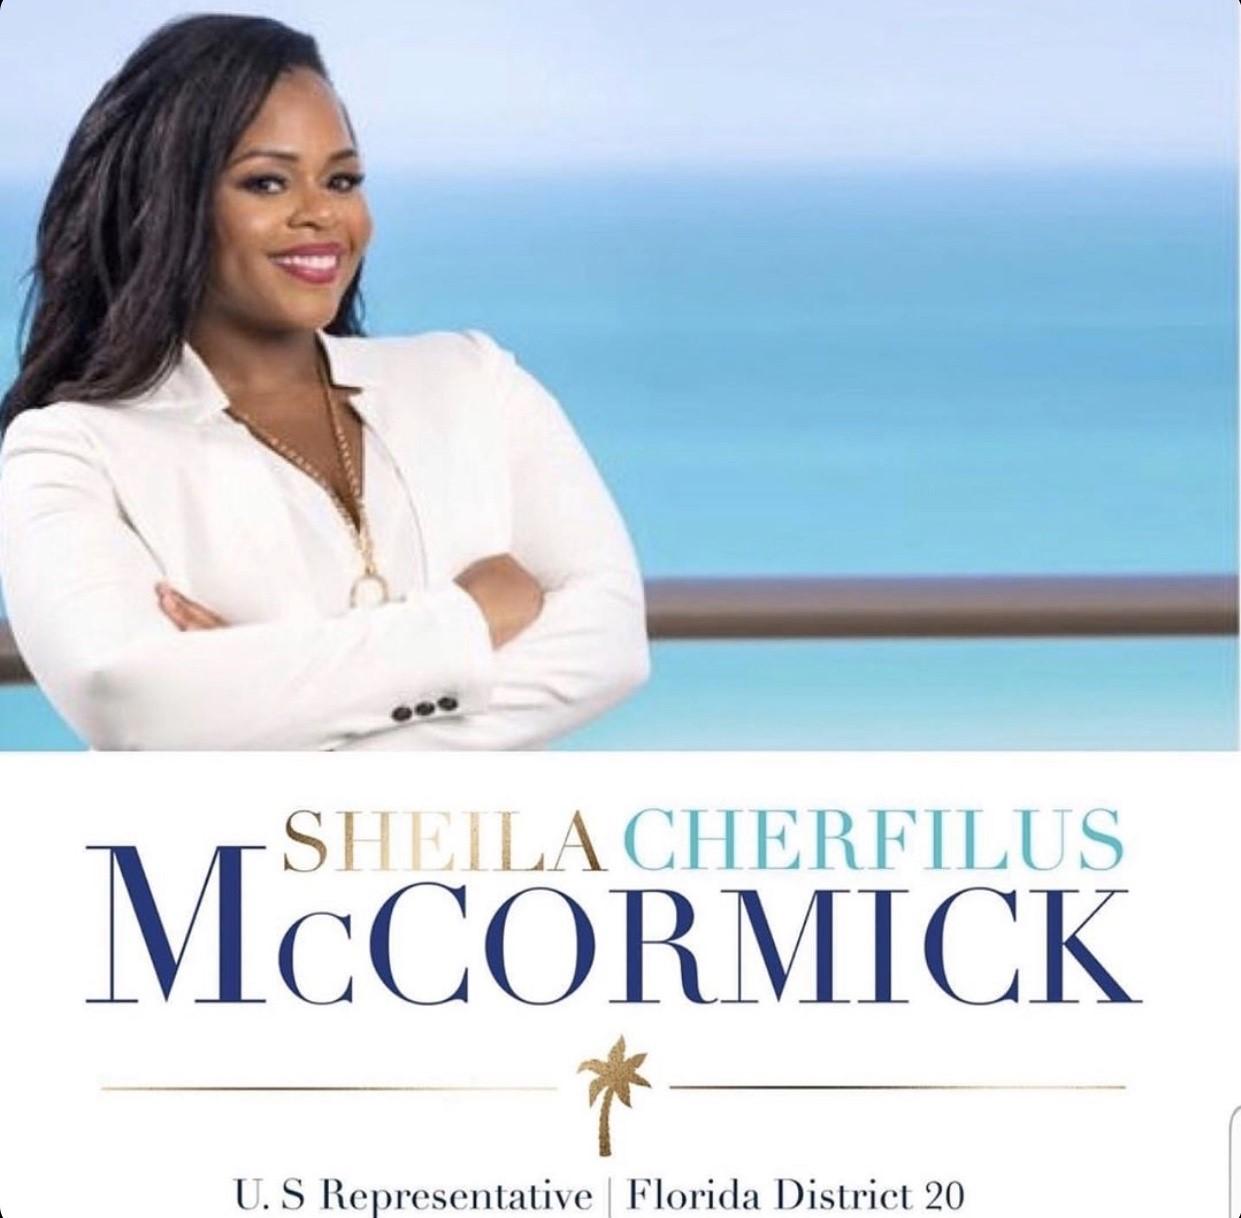 Sheila Cherfilus-McCormick